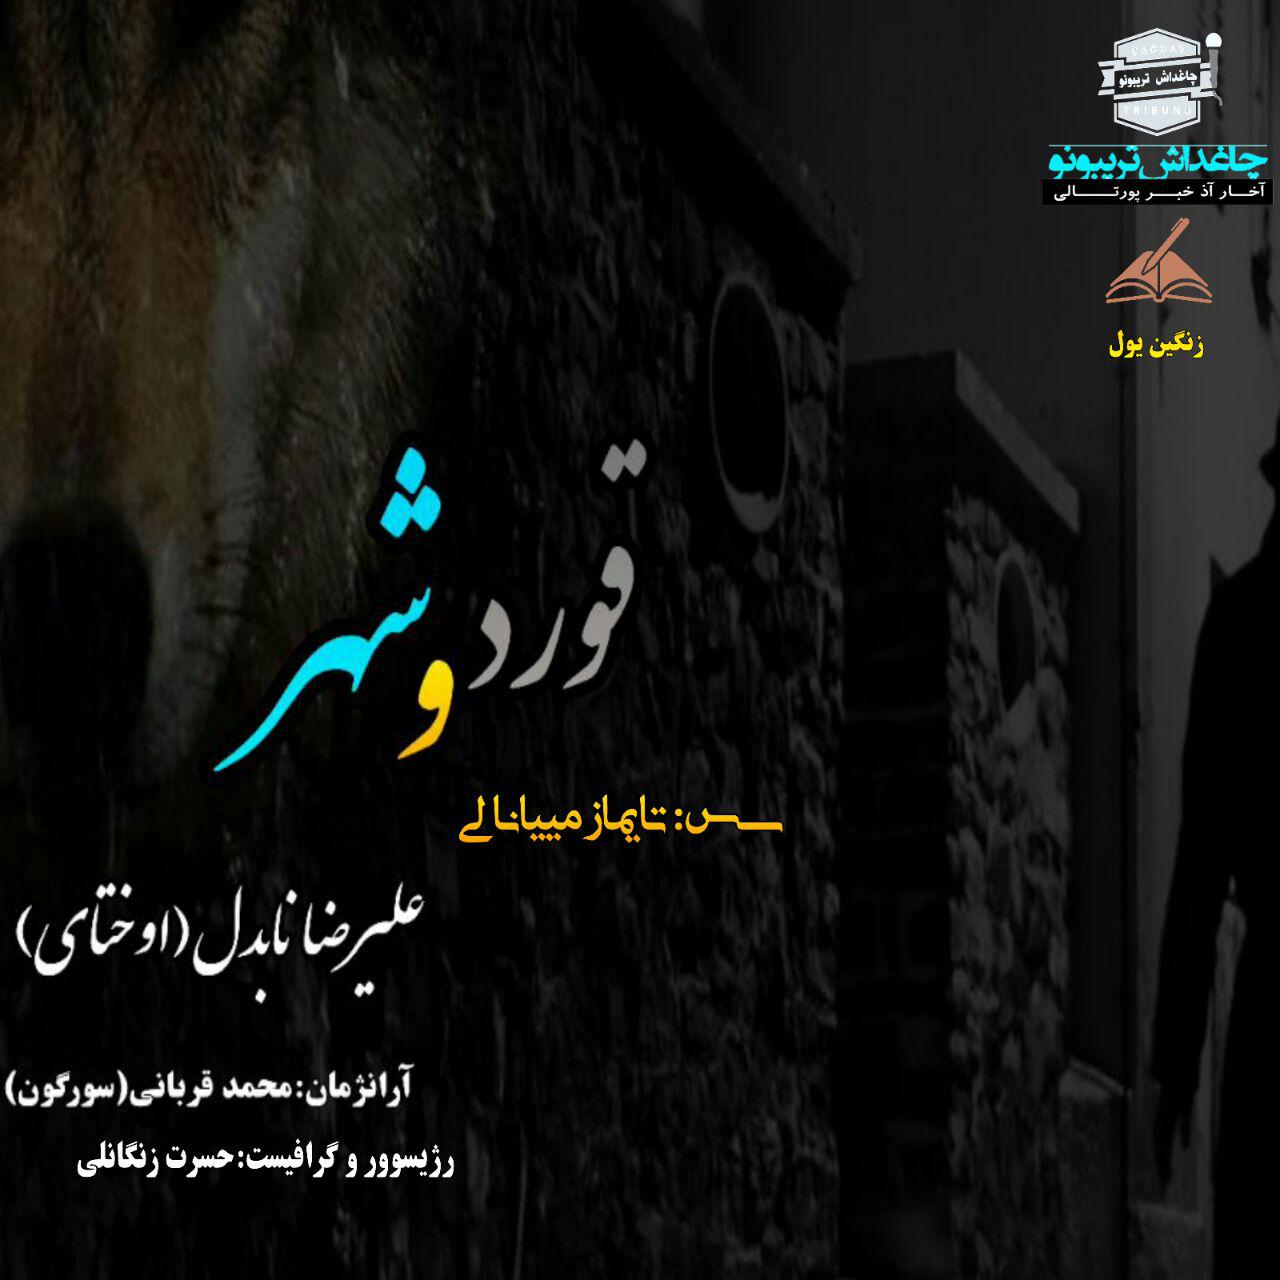 http://s8.picofile.com/file/8334260600/28Taymaz_Miyanali_Qurd_va_Shahr.jpg